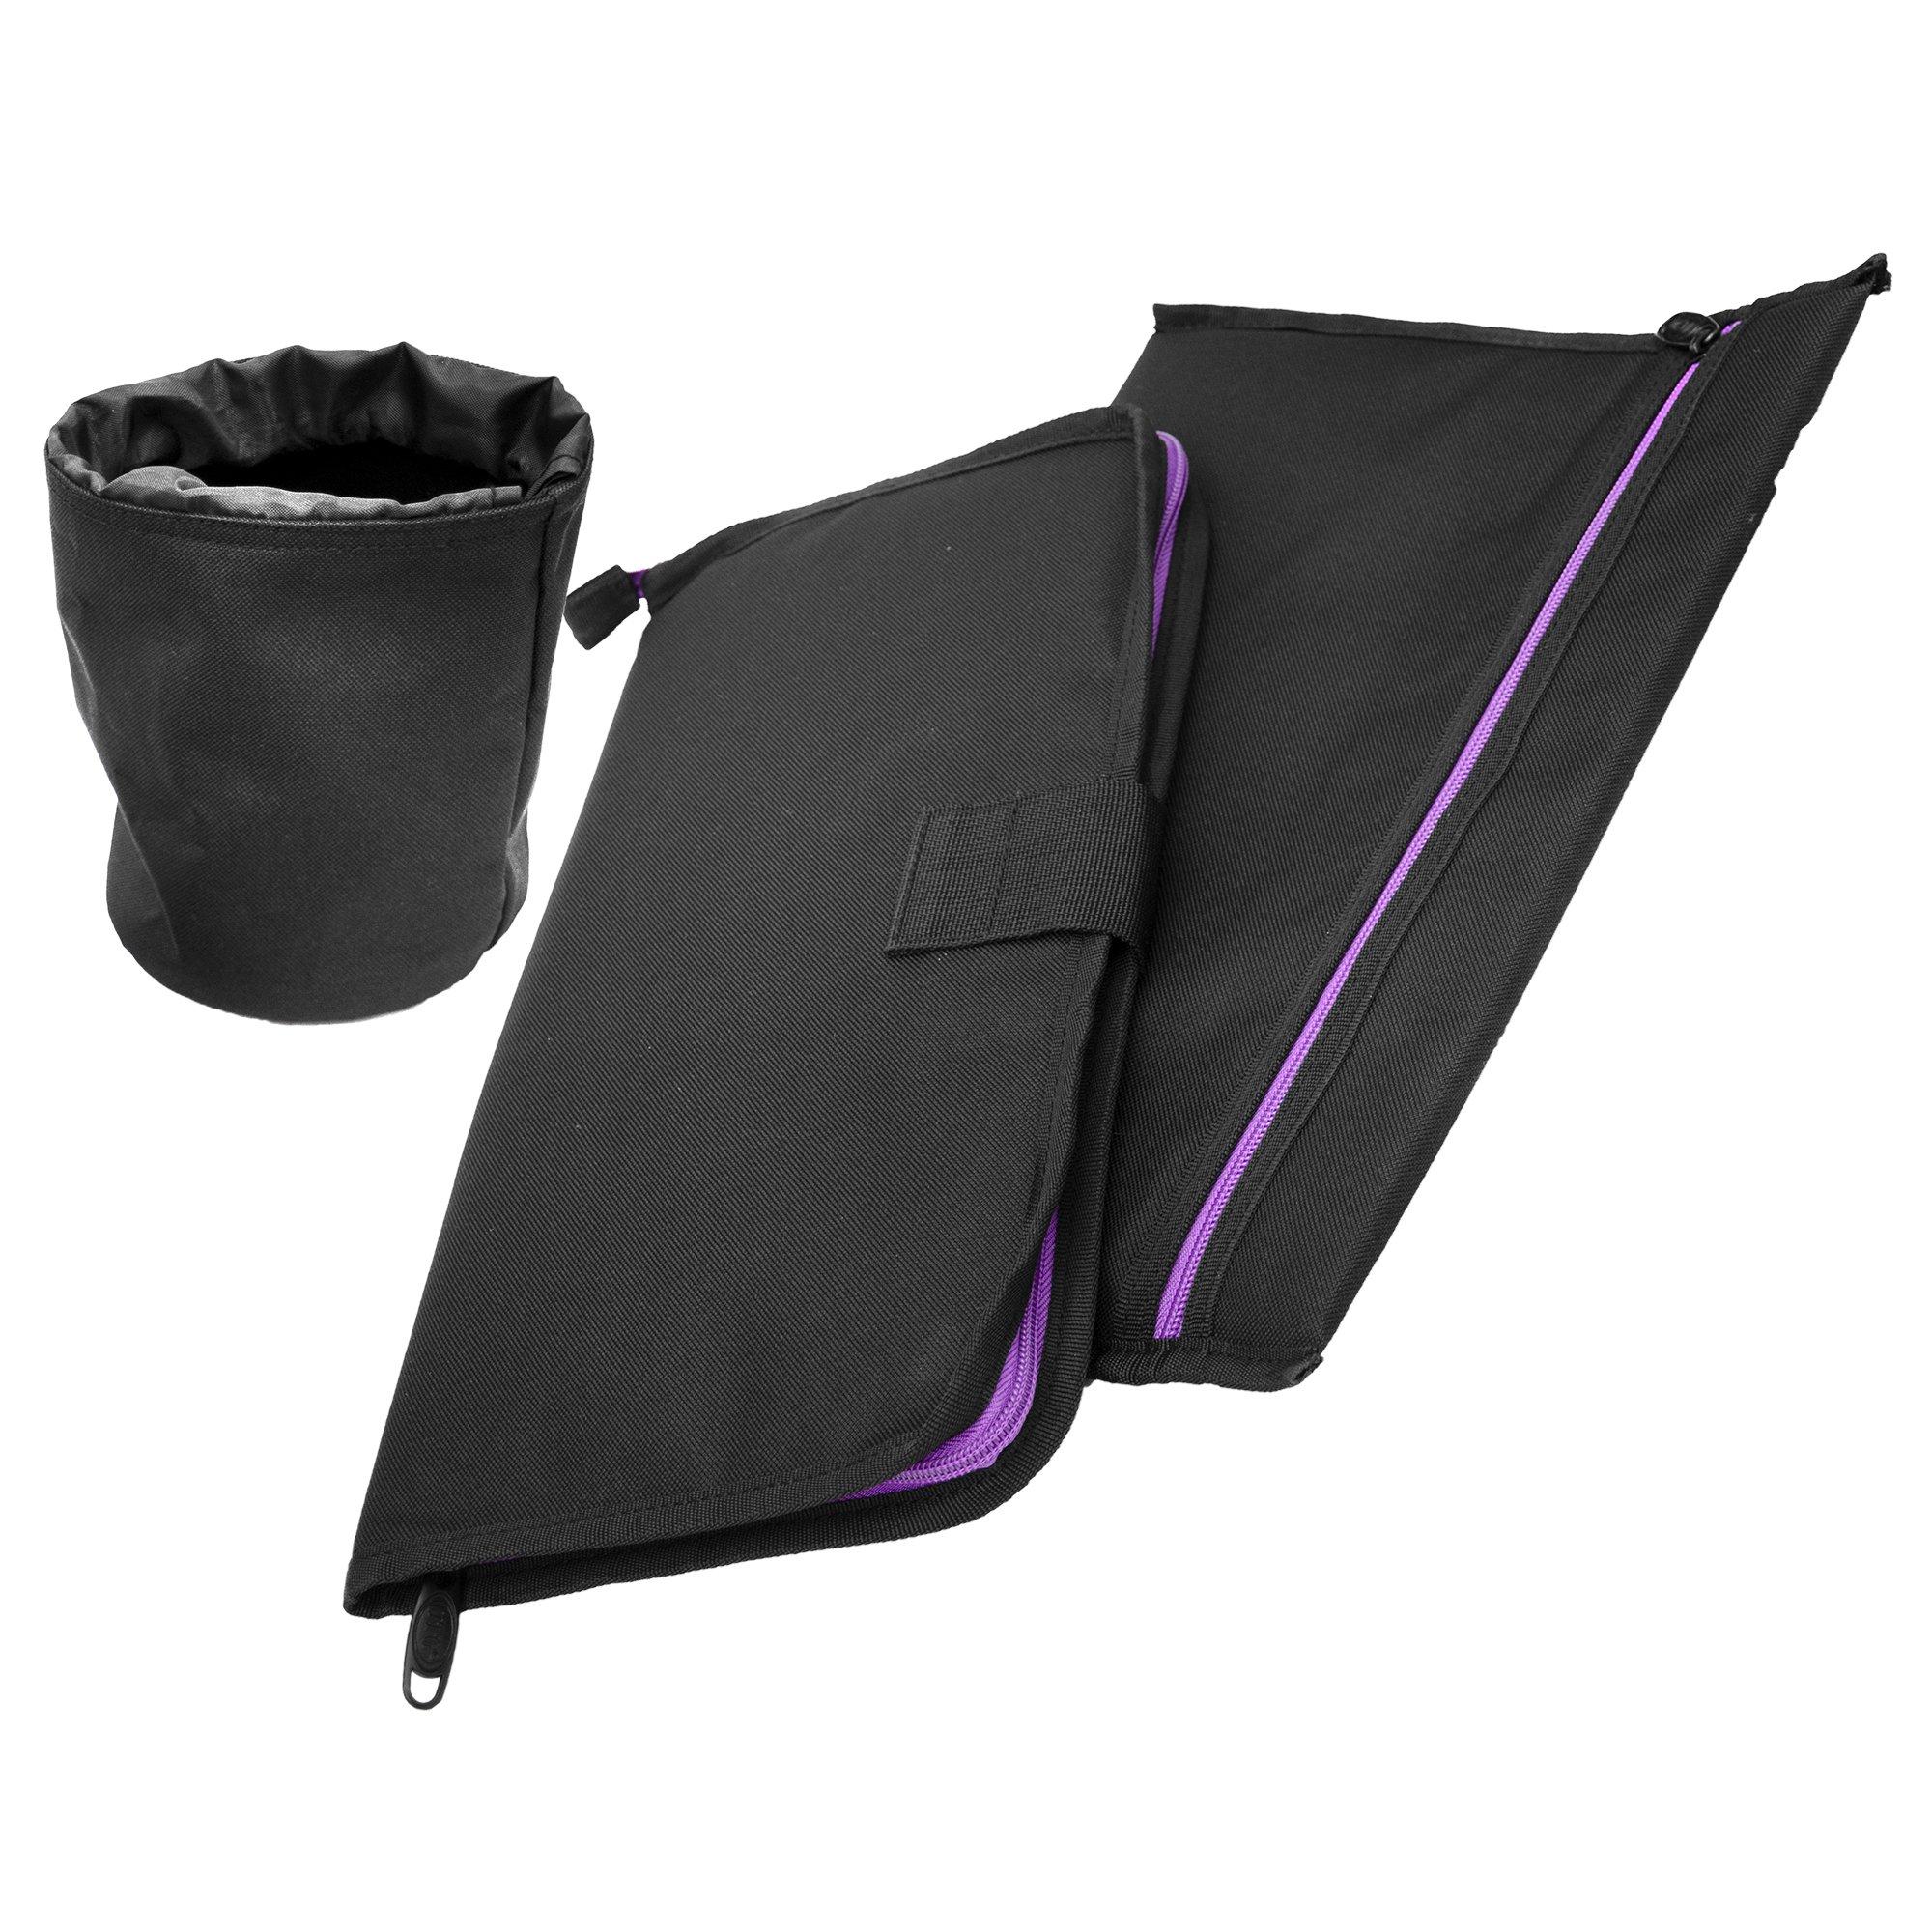 UTG All in One Range/Utility Go Bag, Black/Violet, 21'' x 10'' x 9'' by UTG (Image #14)